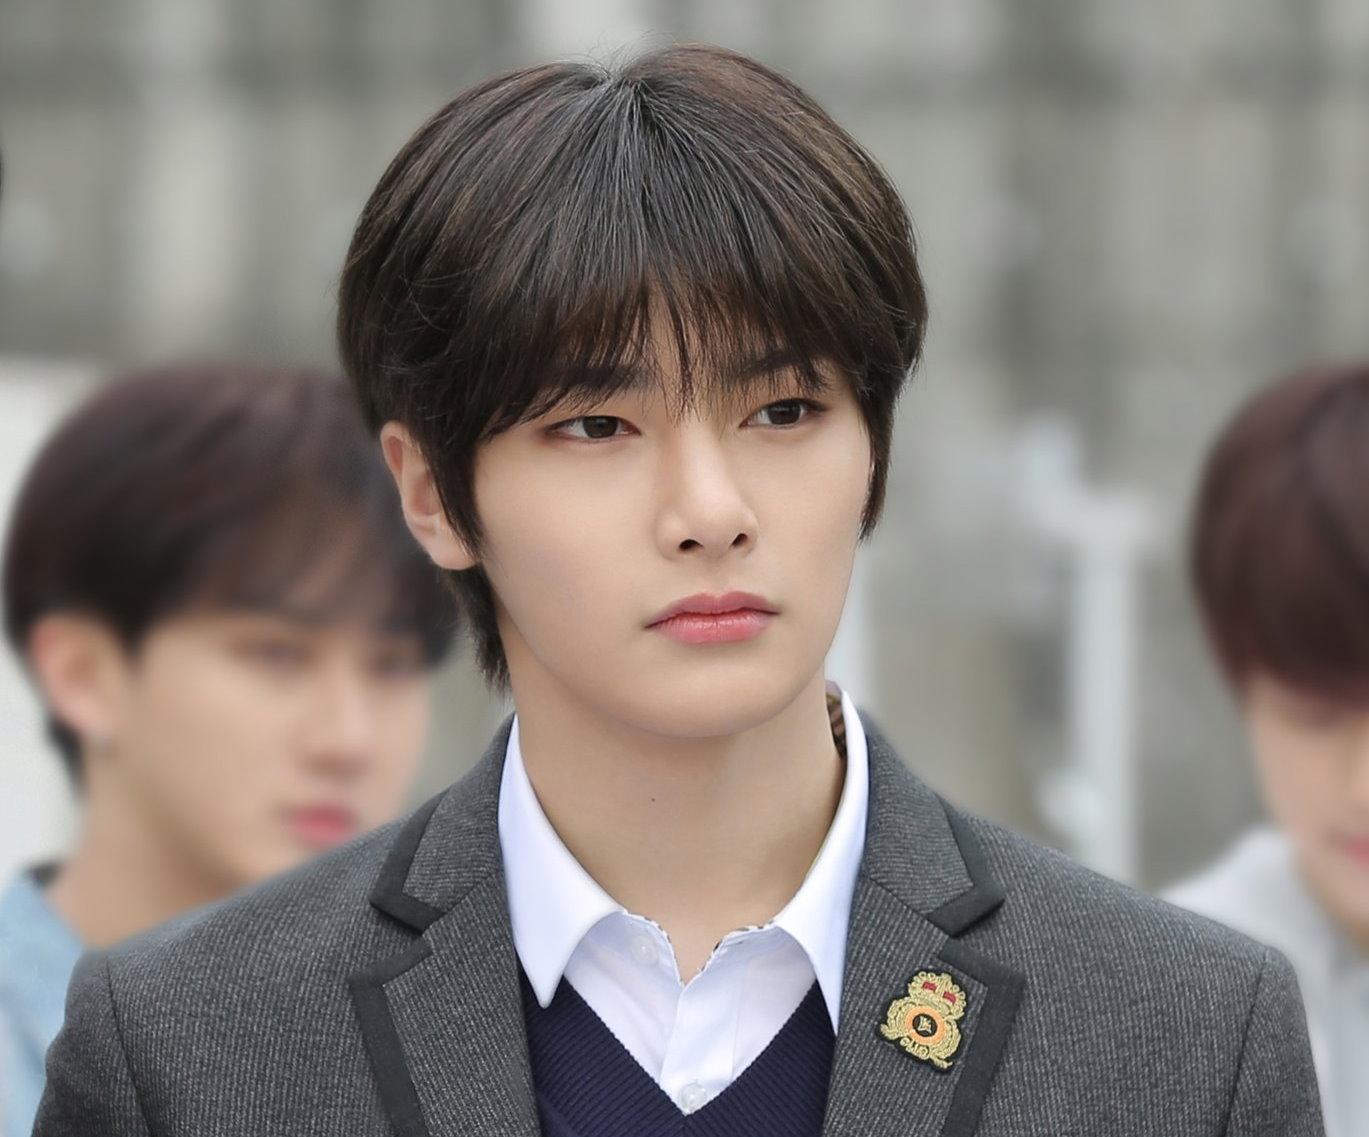 Kpop February 8